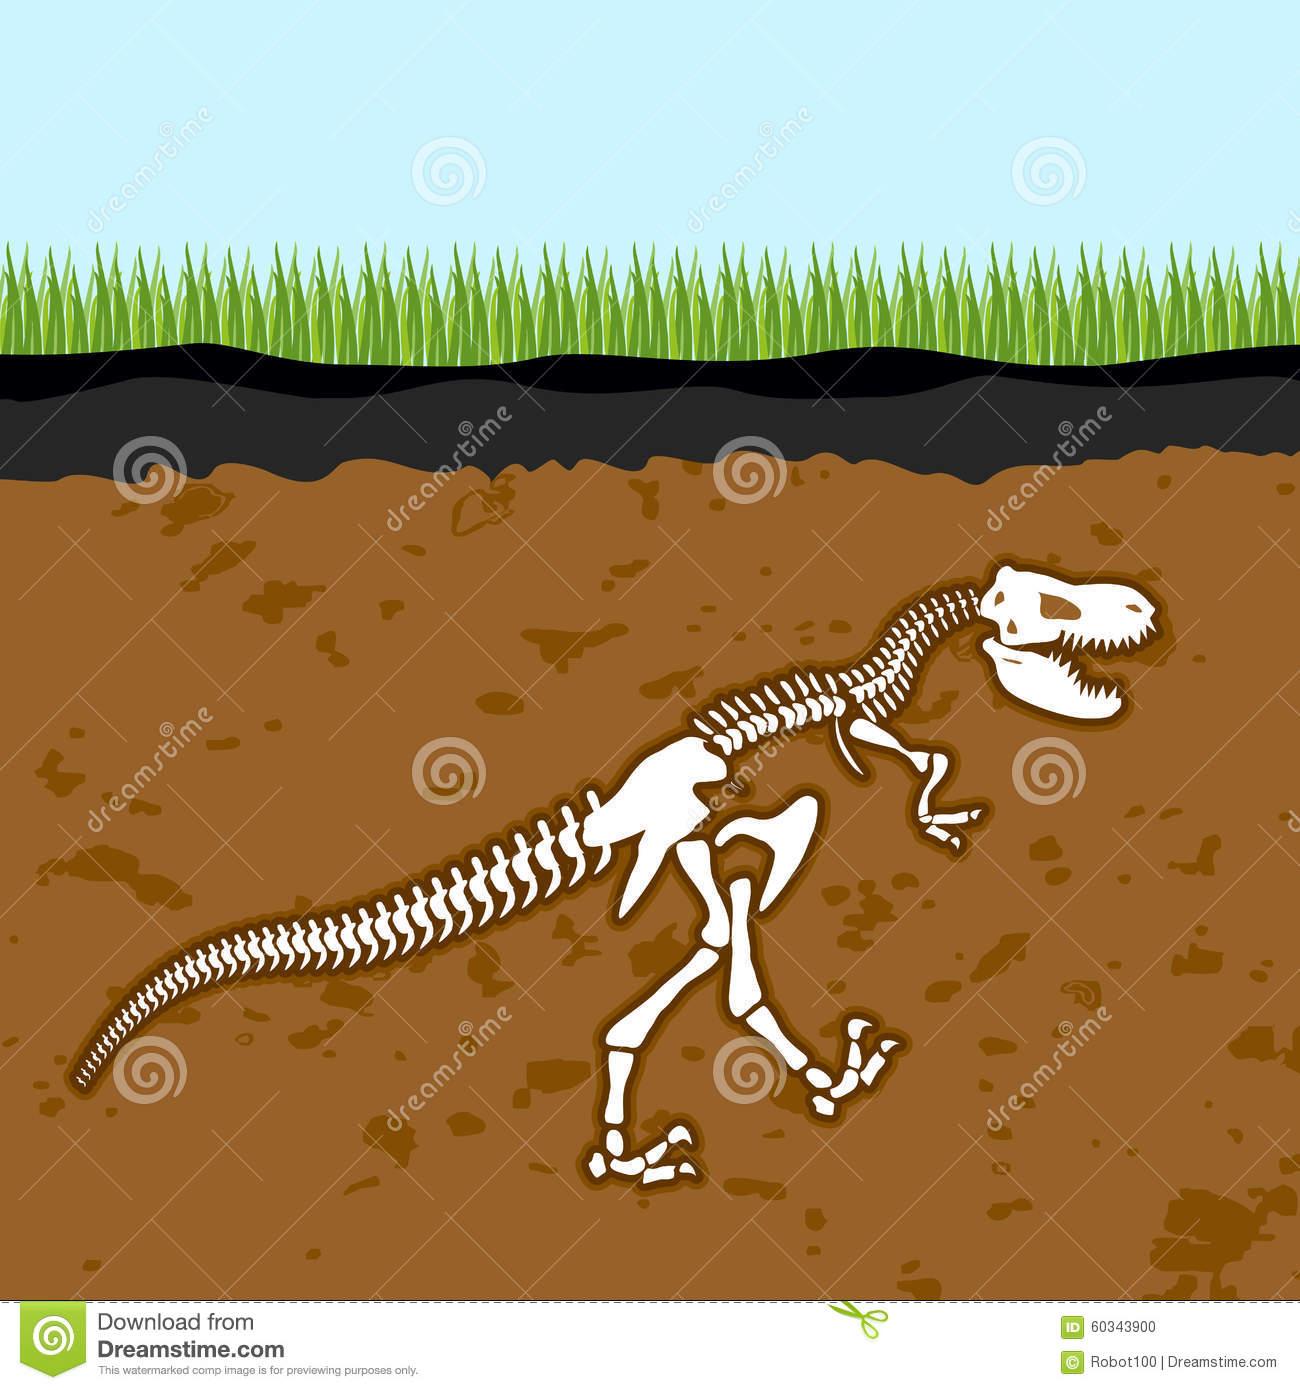 Skeleton Of Tyrannosaurus Rex. Dinosaur Bones In Earth. Fossil.